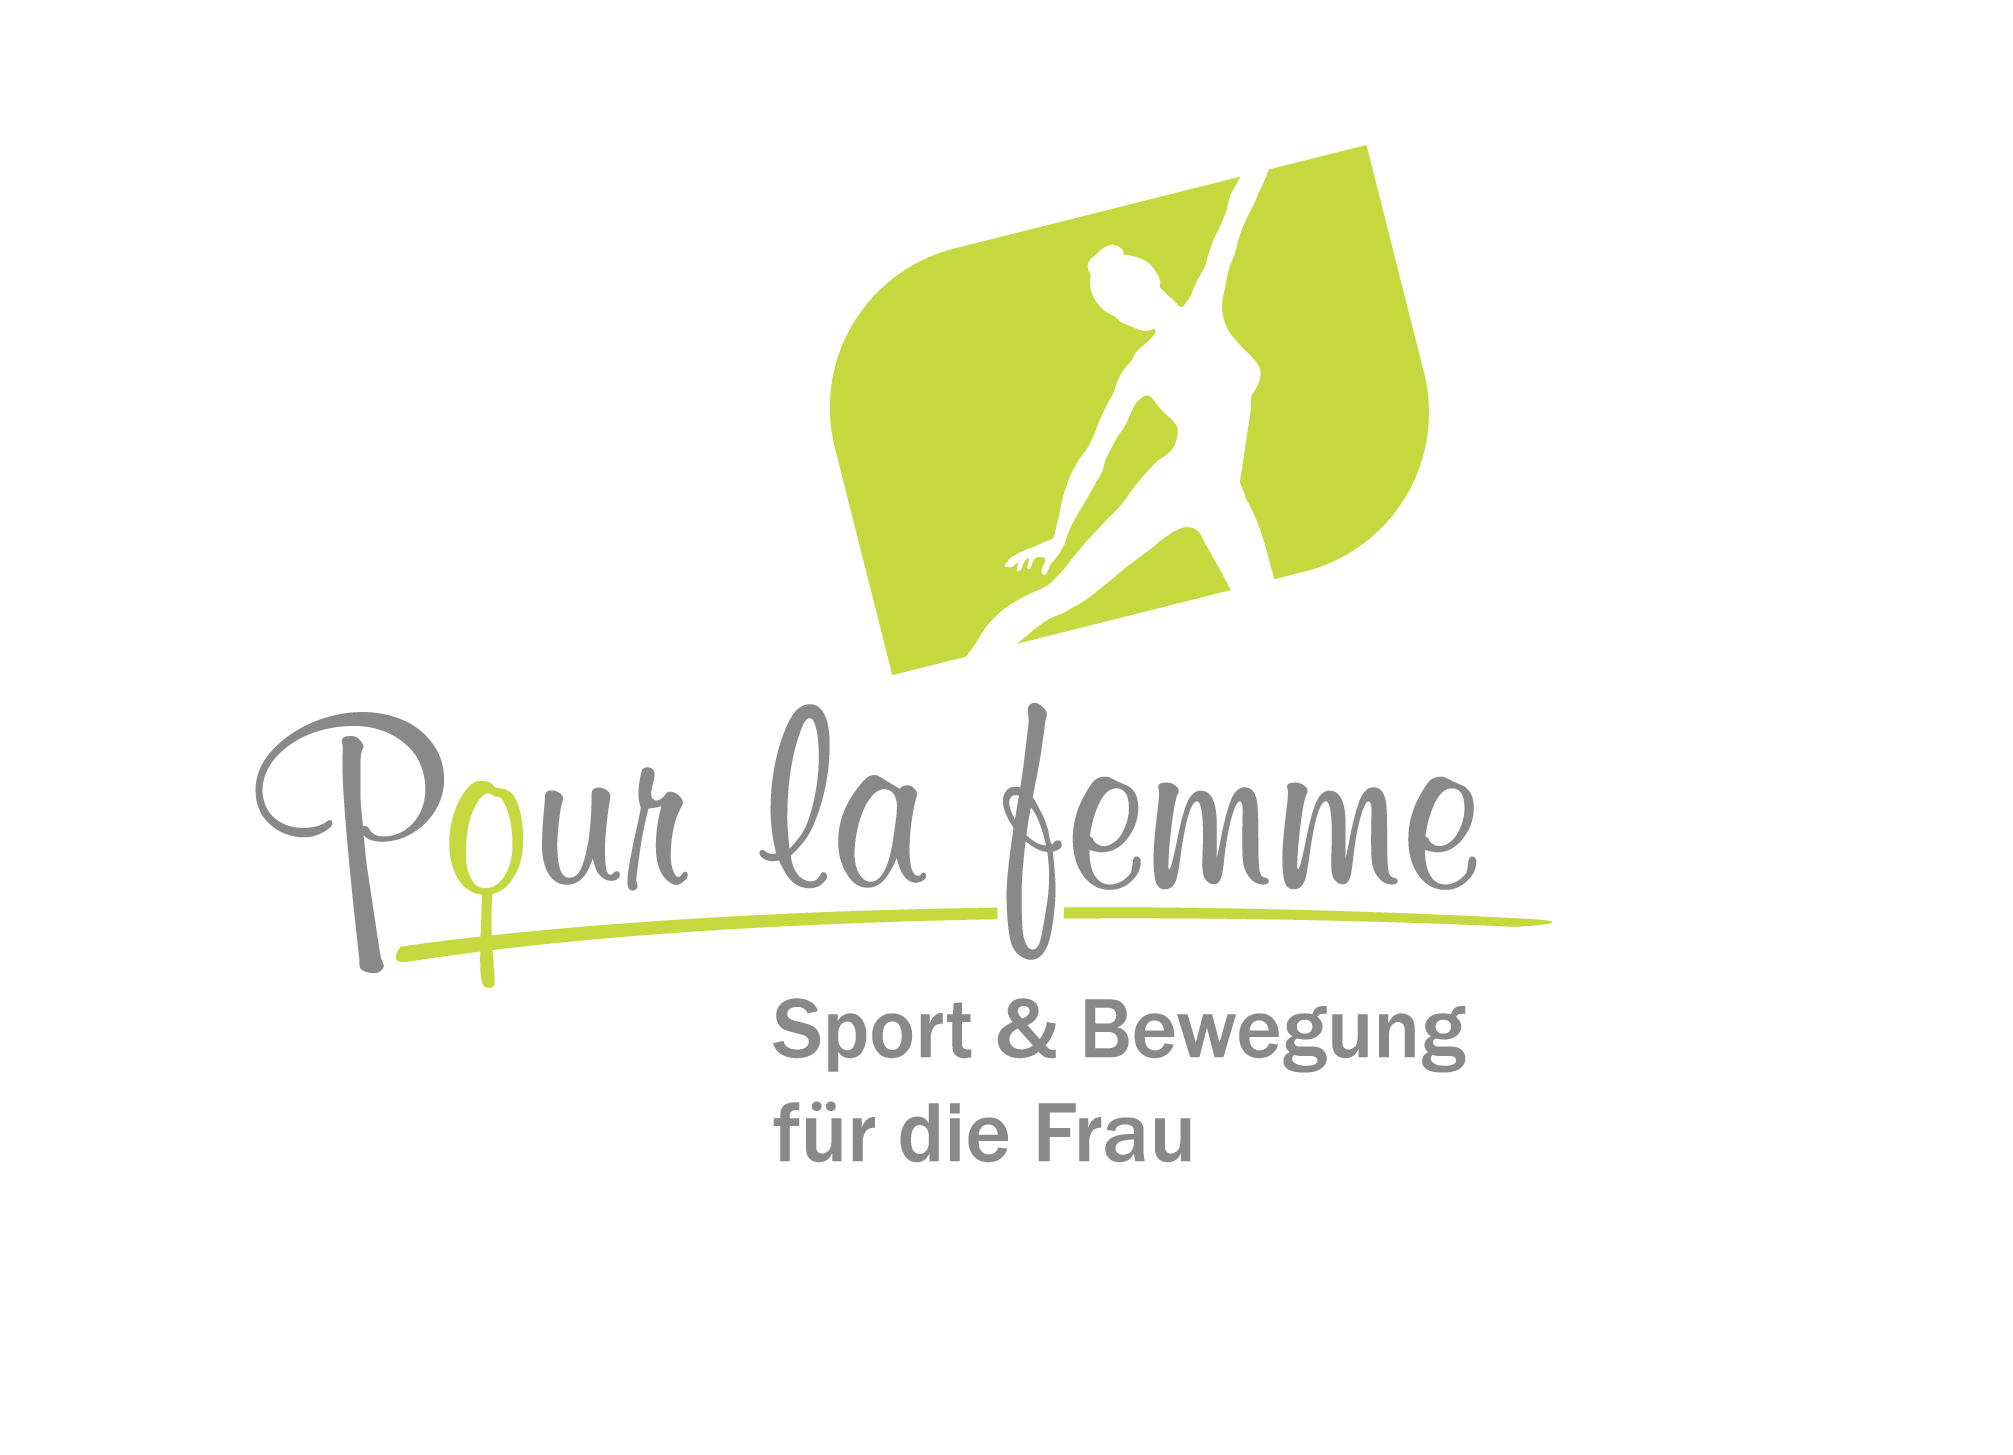 Frauensportstudio Pour la femme Logo